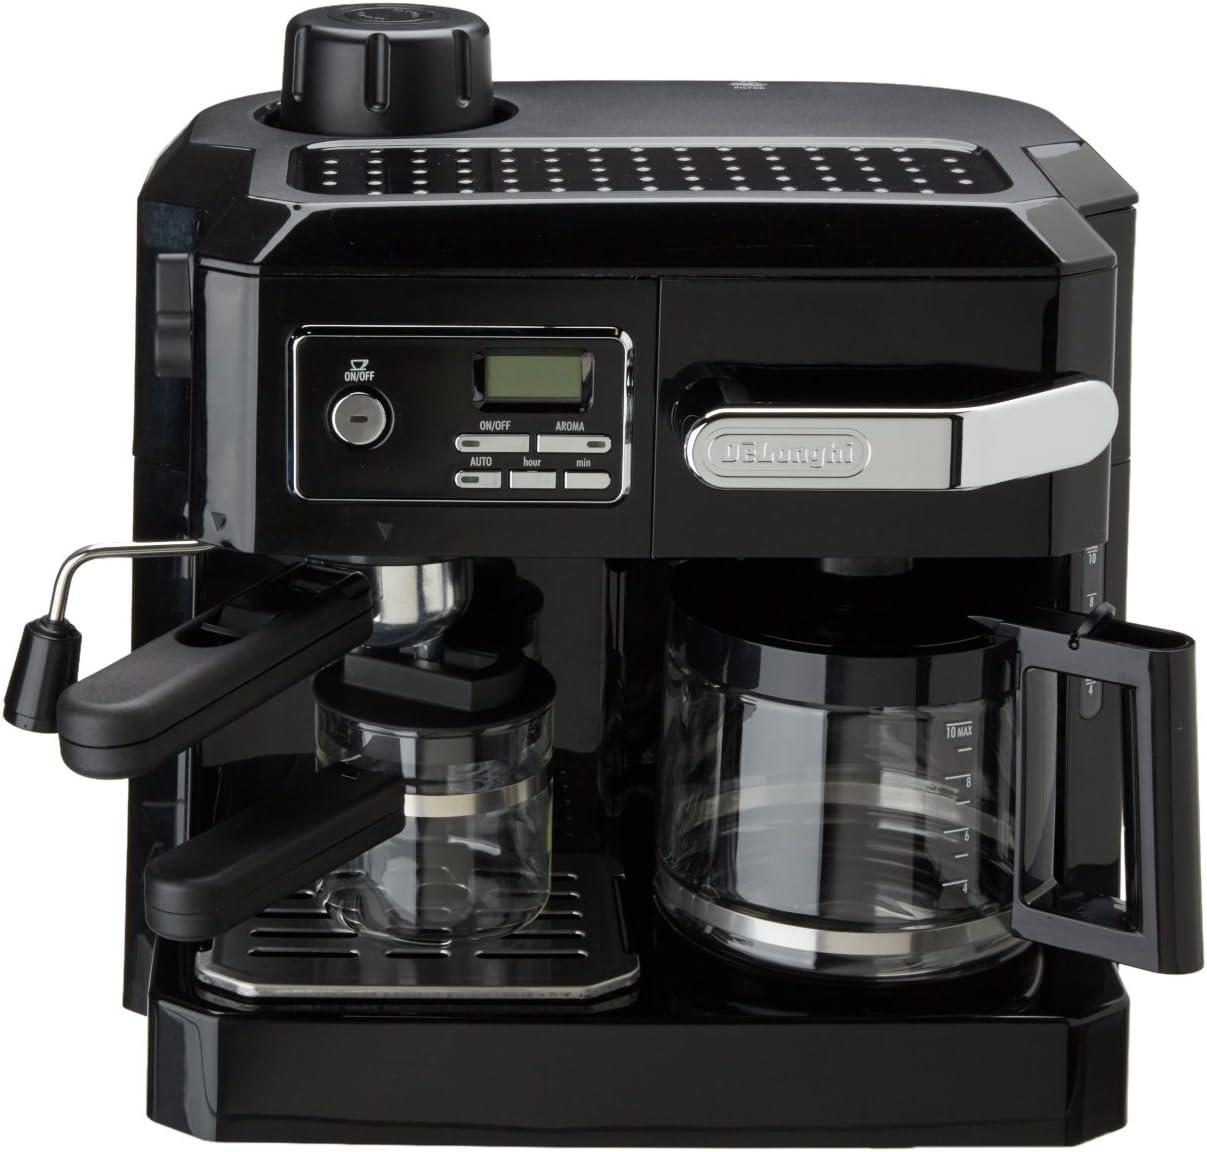 Amazon.com: DeLonghi - Cafetera combinada para café ...